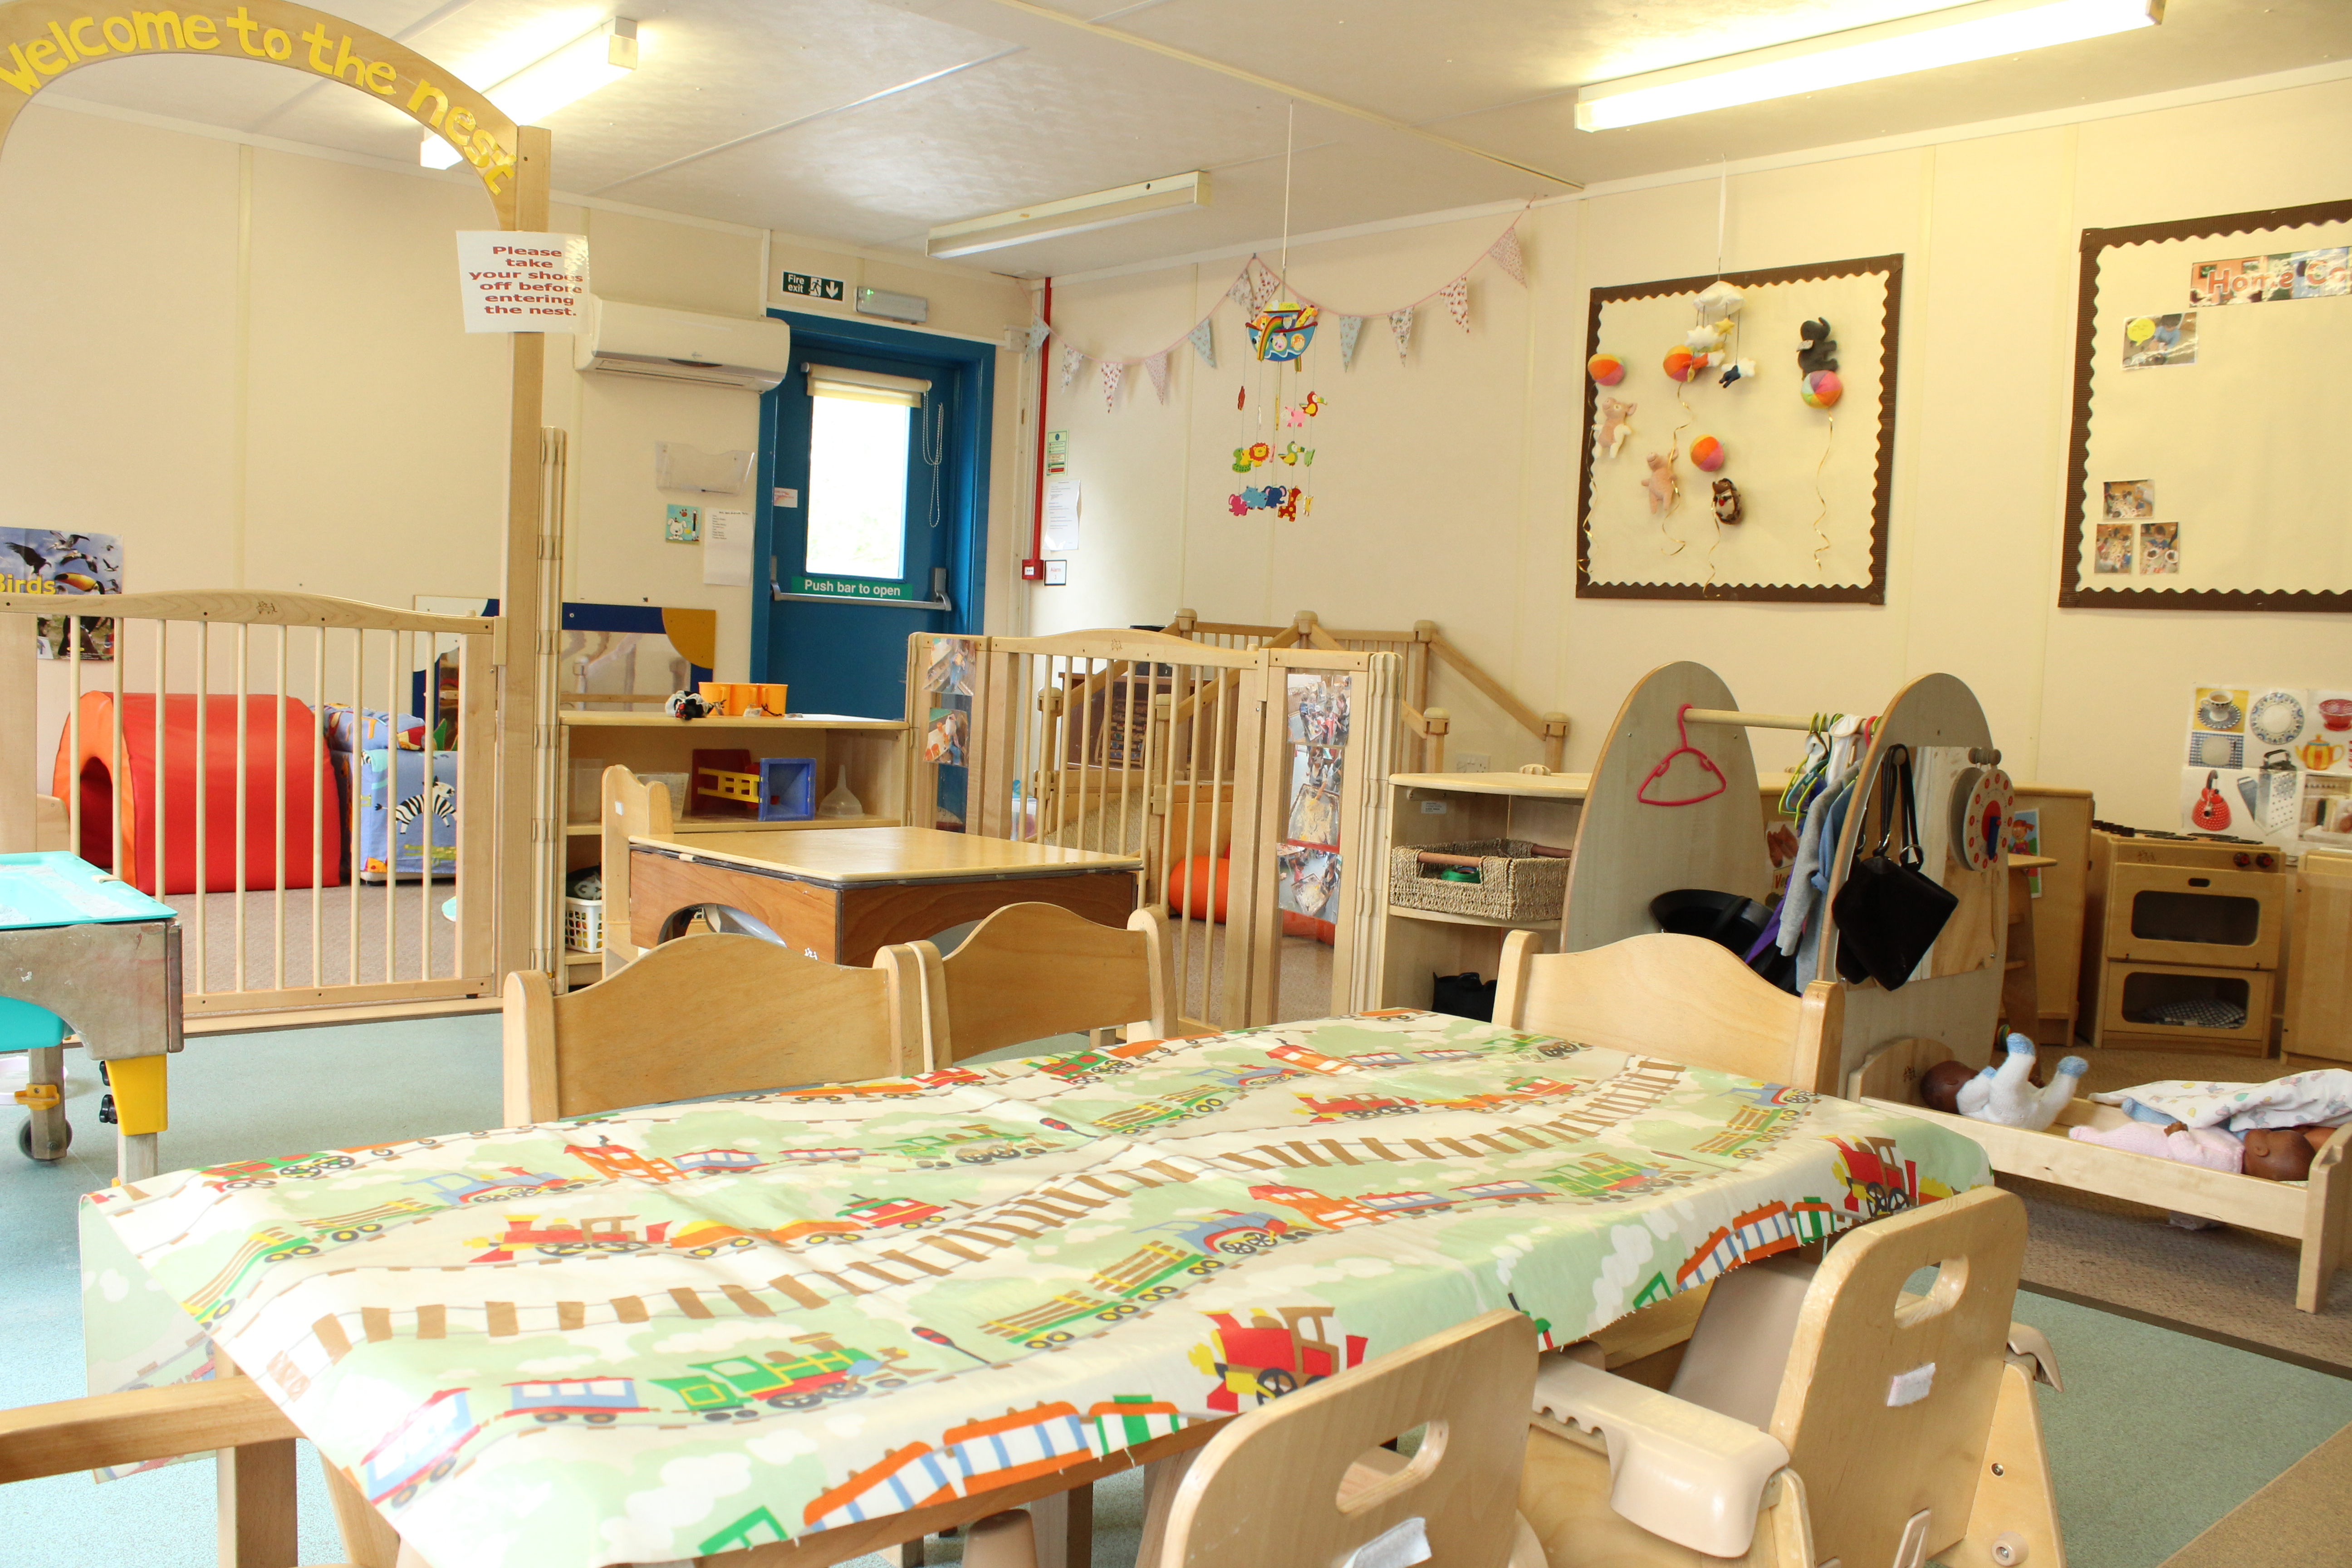 Photo of inside the nursery